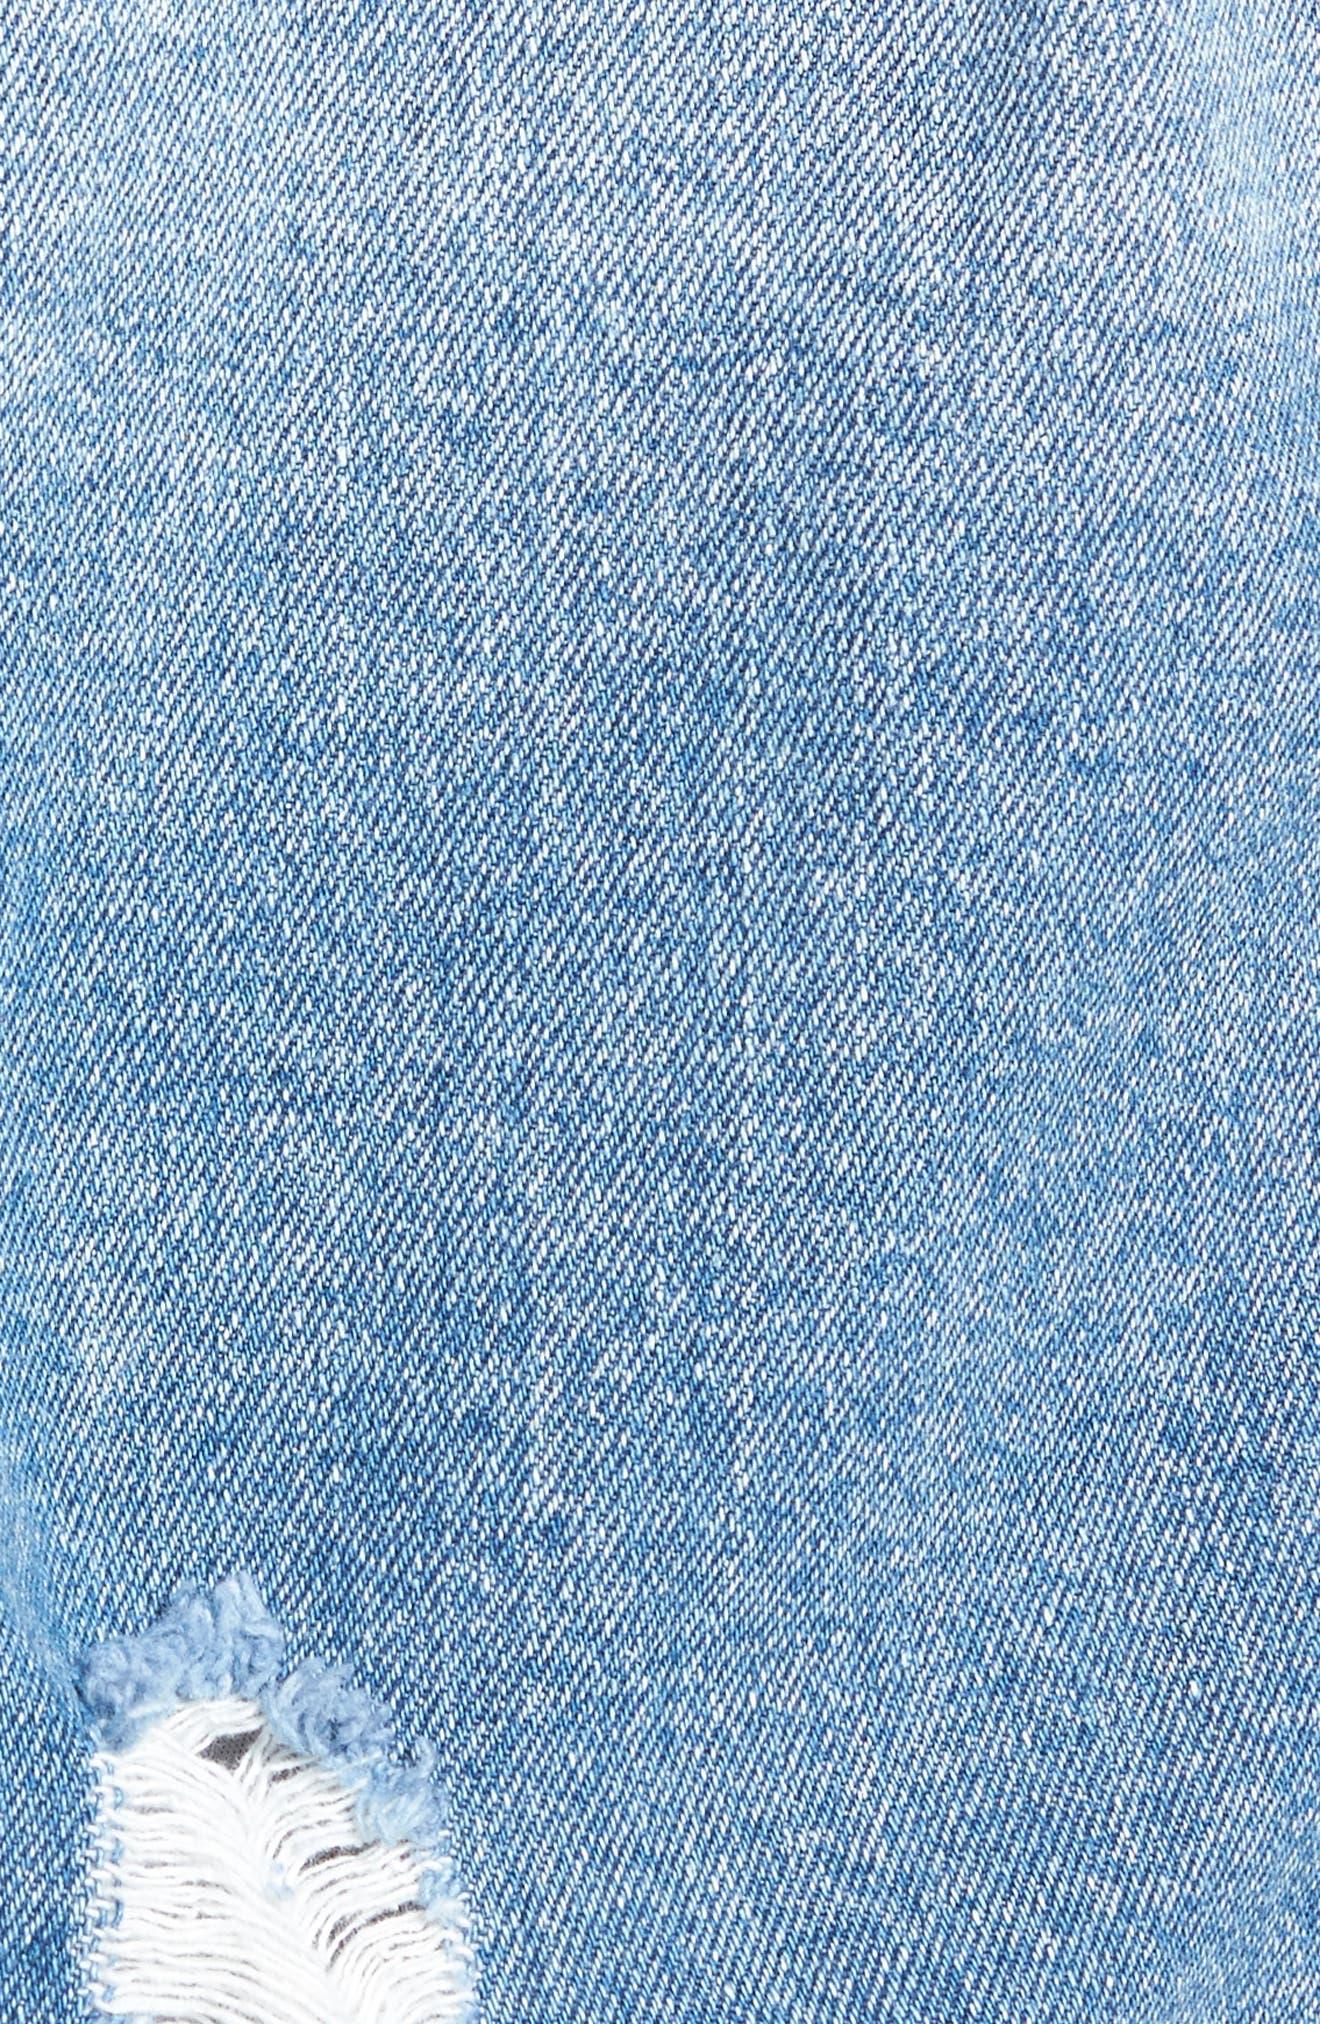 Alternate Image 5  - MOON RIVER Distressed Denim Jacket